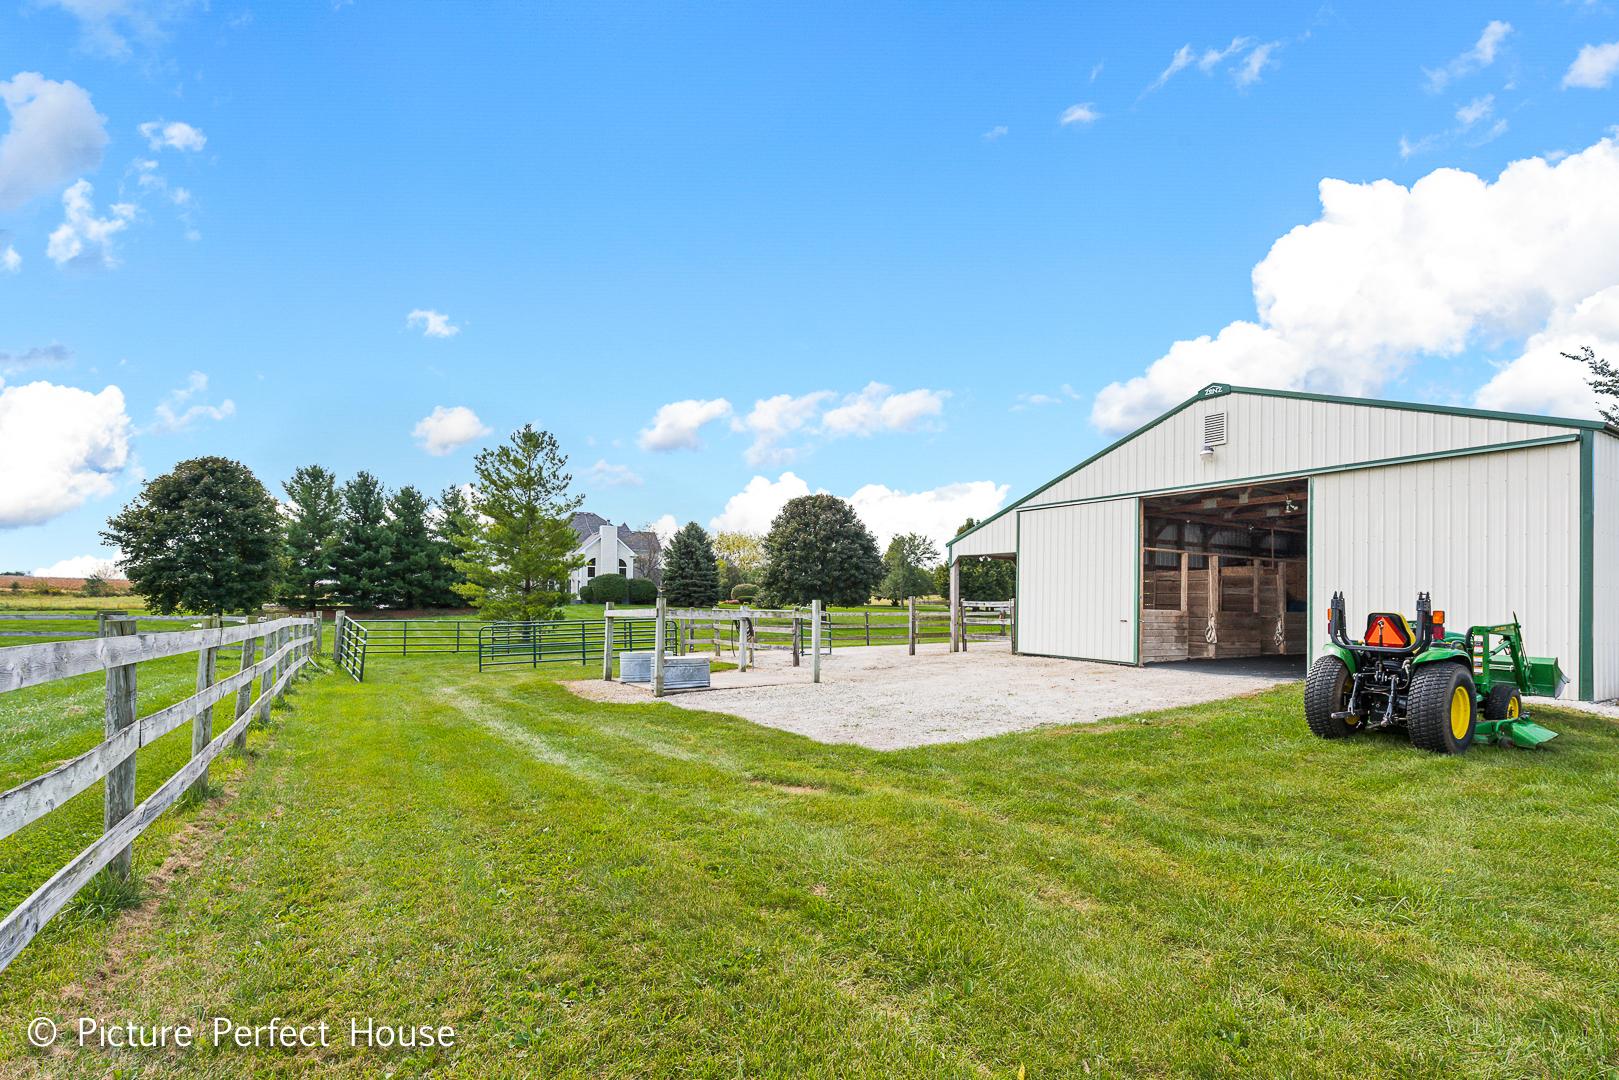 3426 Stewart, Oswego, Illinois, 60543